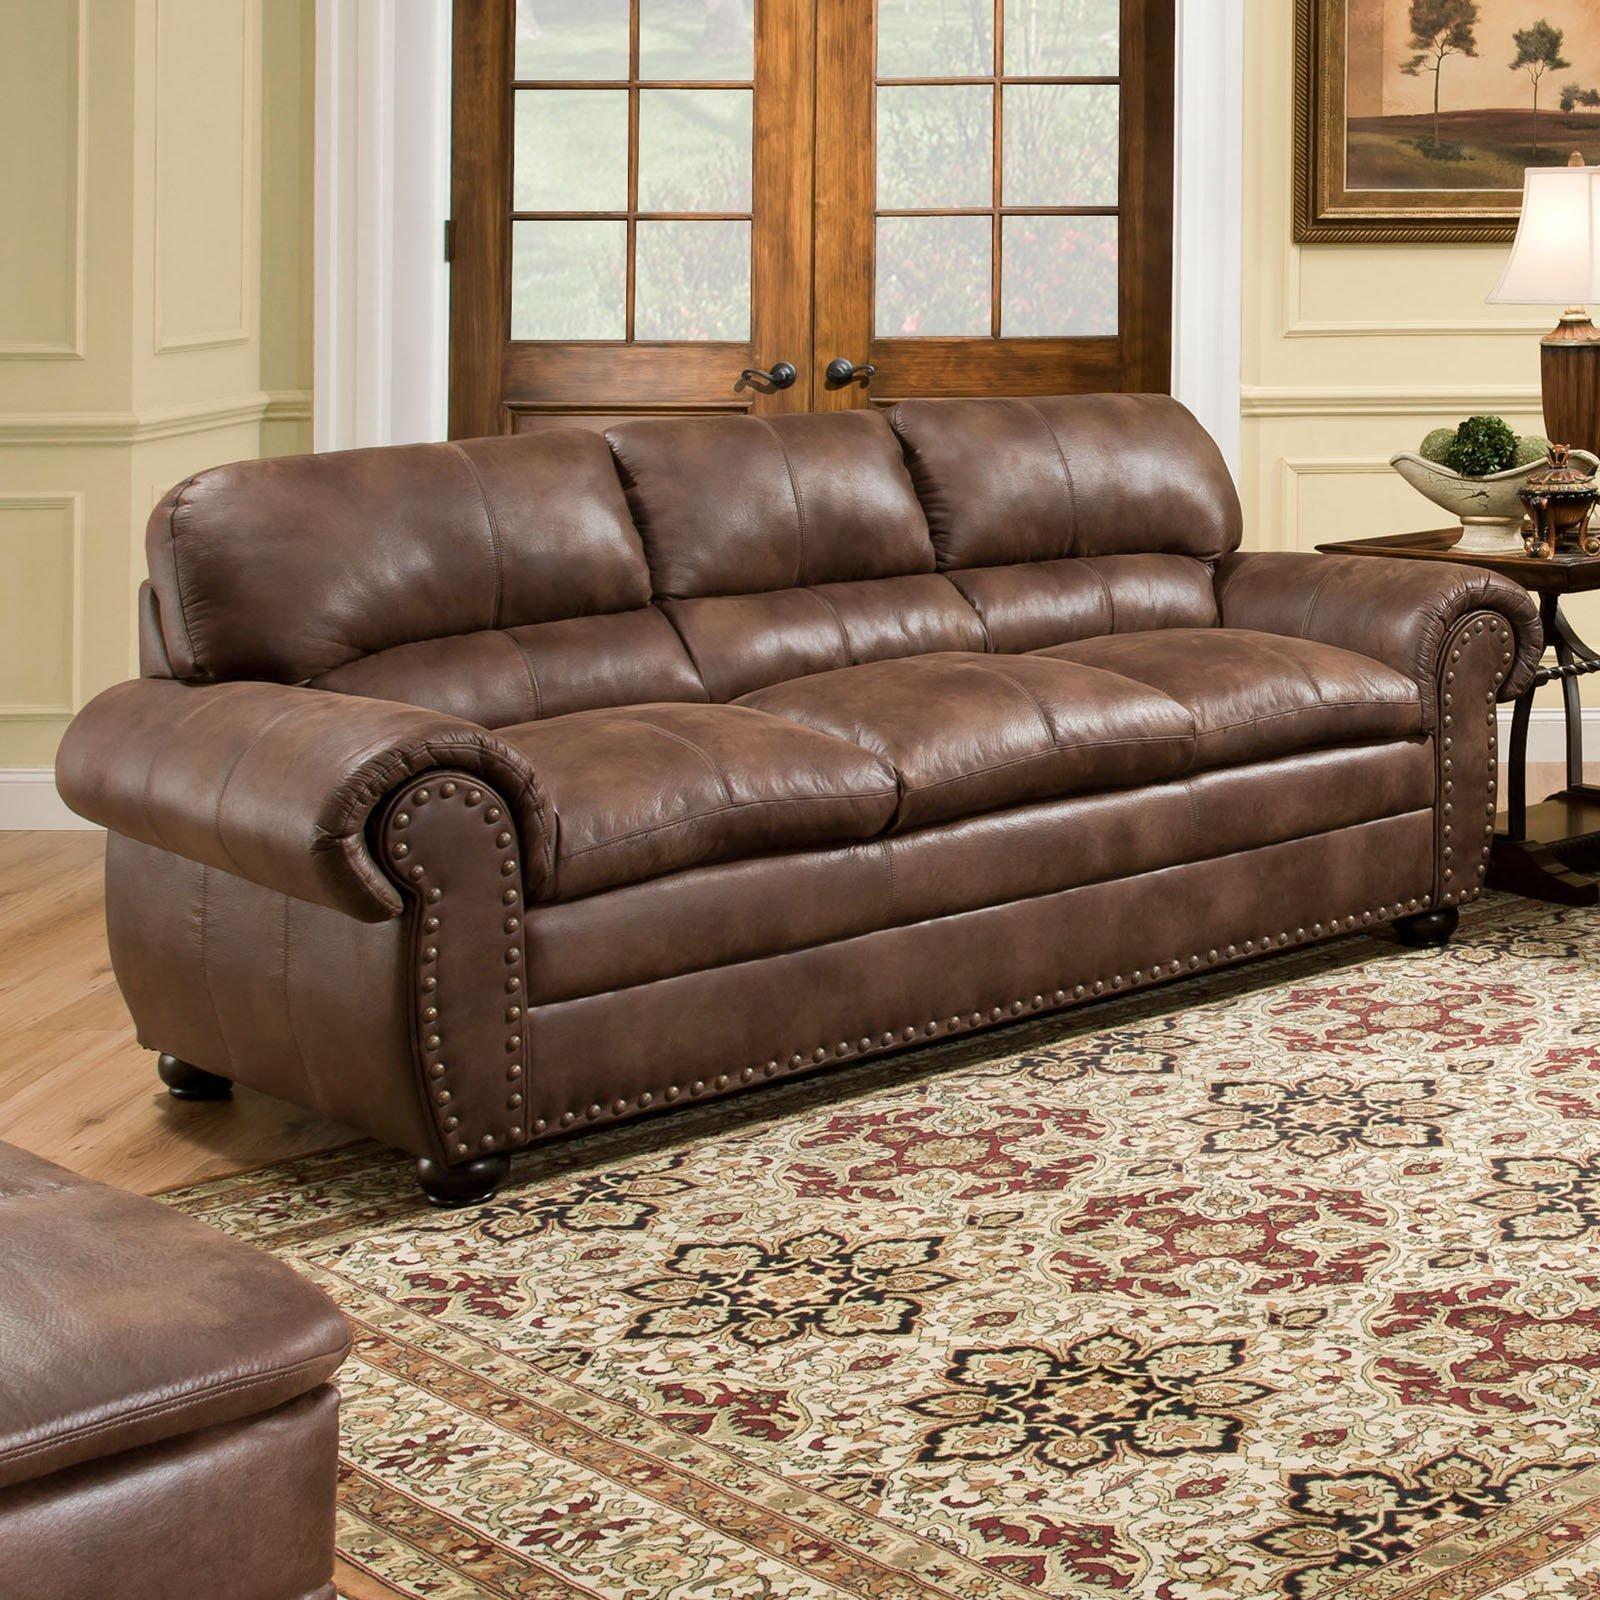 Simmons Upholstery Padre Sofa – Espresso | Hayneedle Regarding Simmons Sofas And Loveseats (Image 13 of 20)